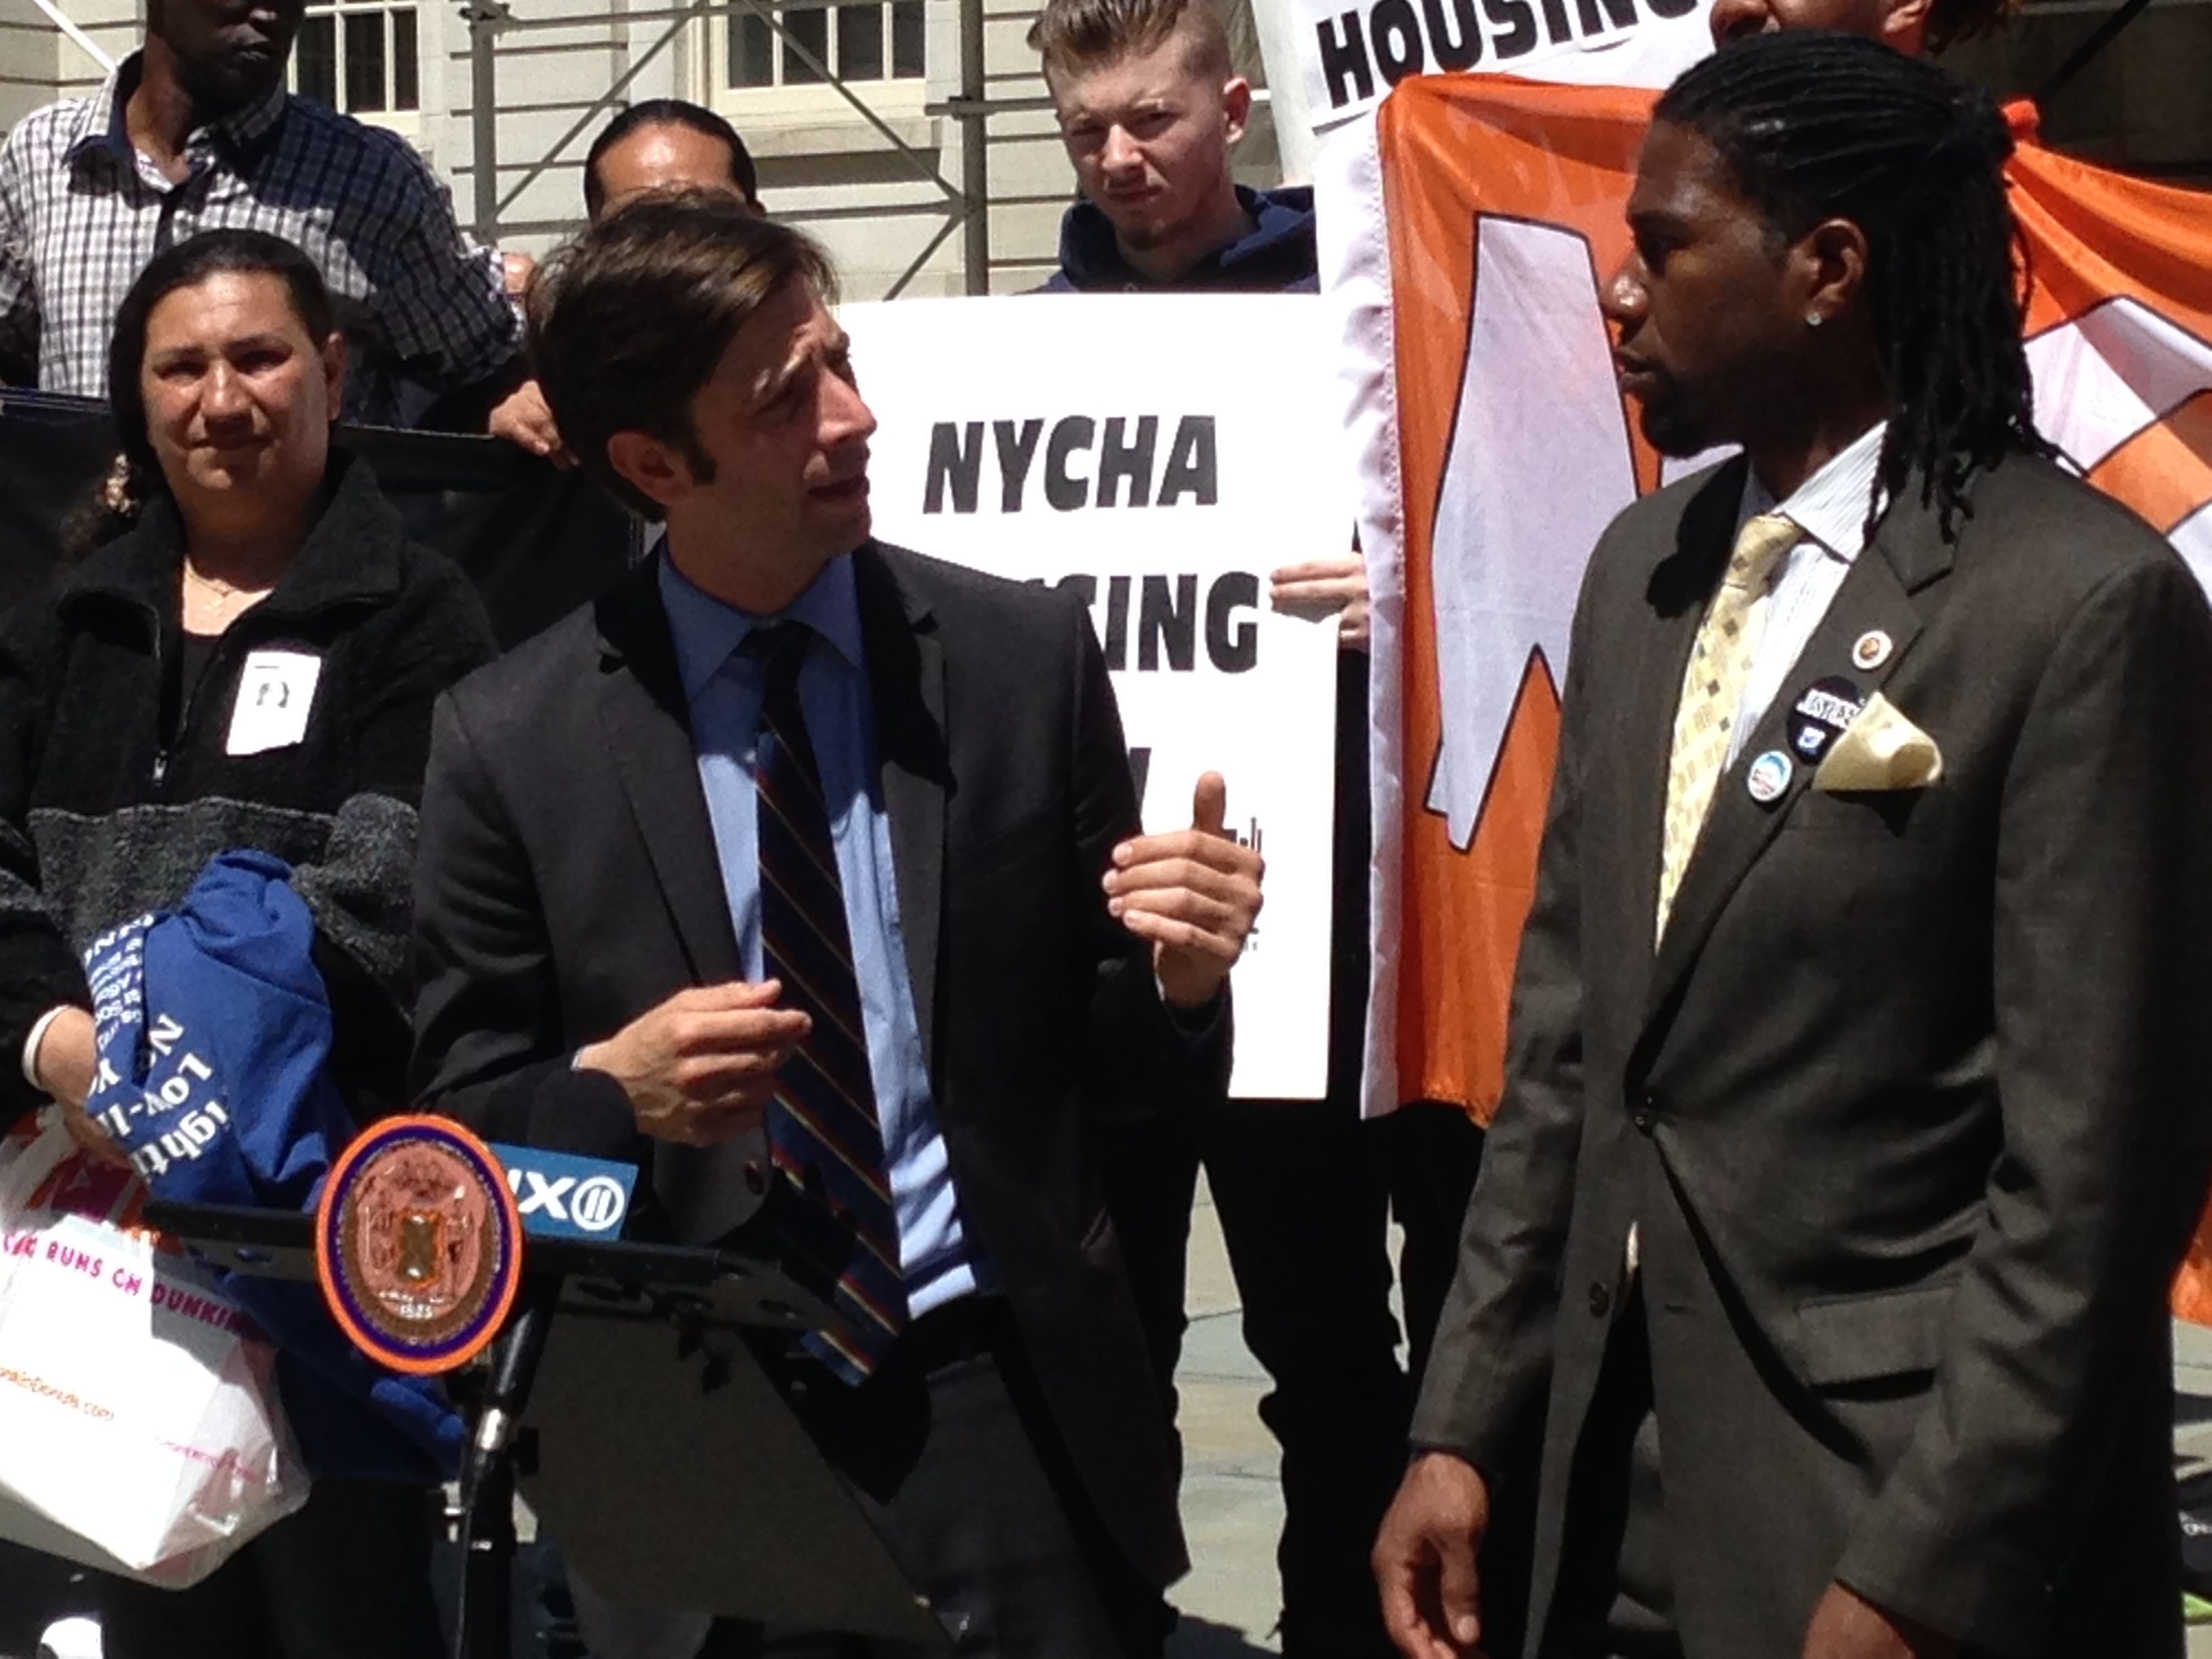 Councilman Stephen Levin, left, and Councilman Jumaane Williams today (Photo: Will Bredderman/New York Observer).